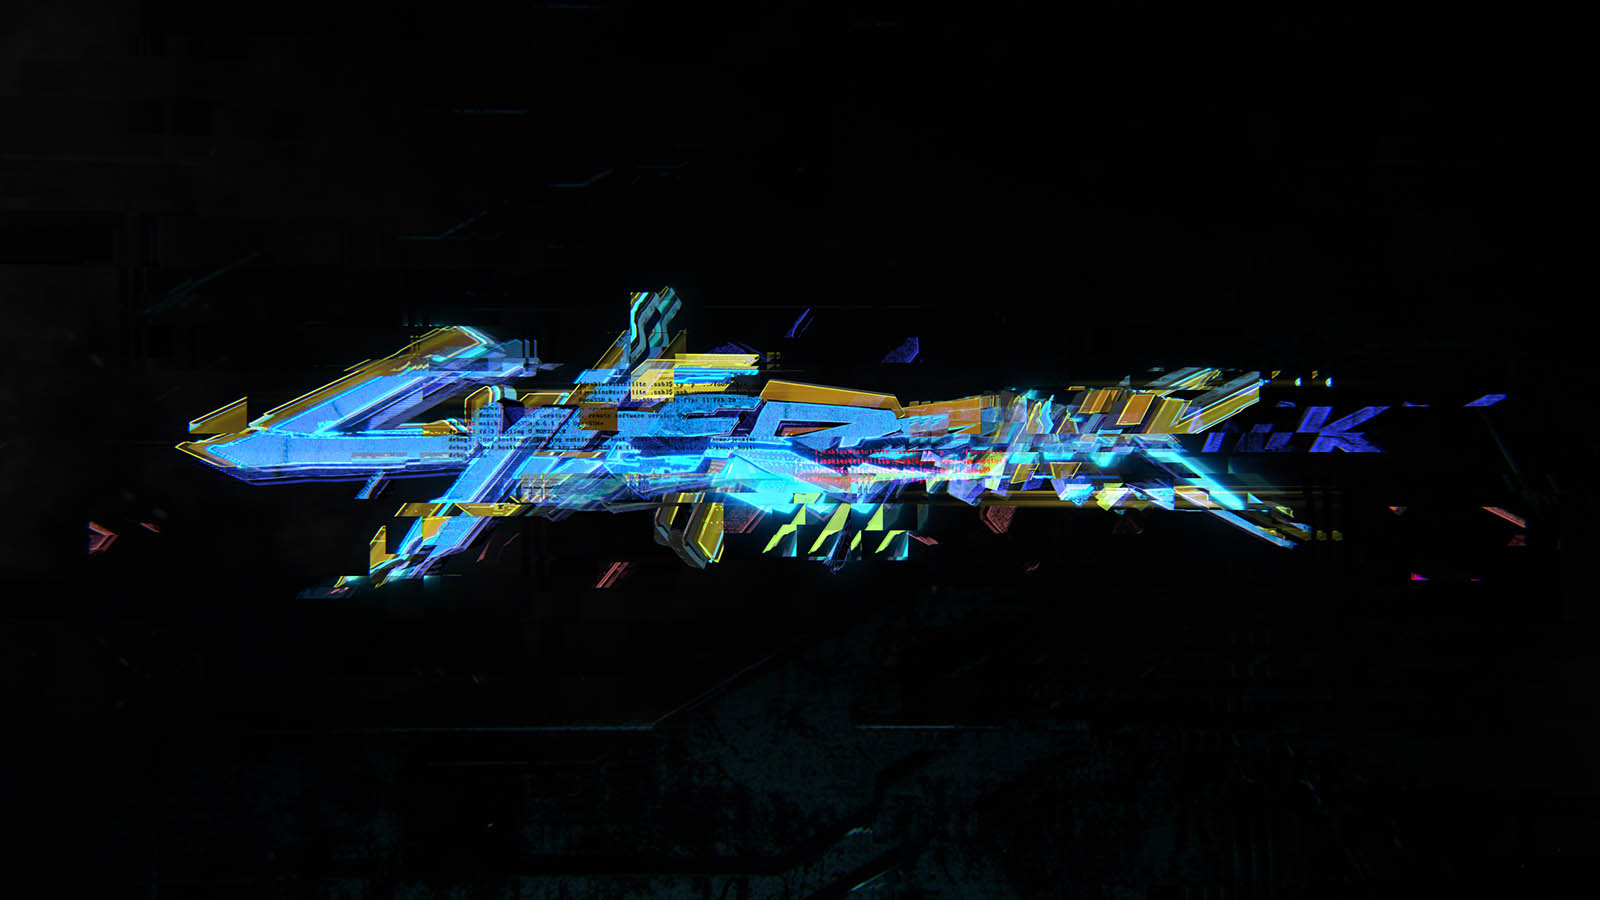 Cyberpunk_LogoSting_TerritoryStudio_005